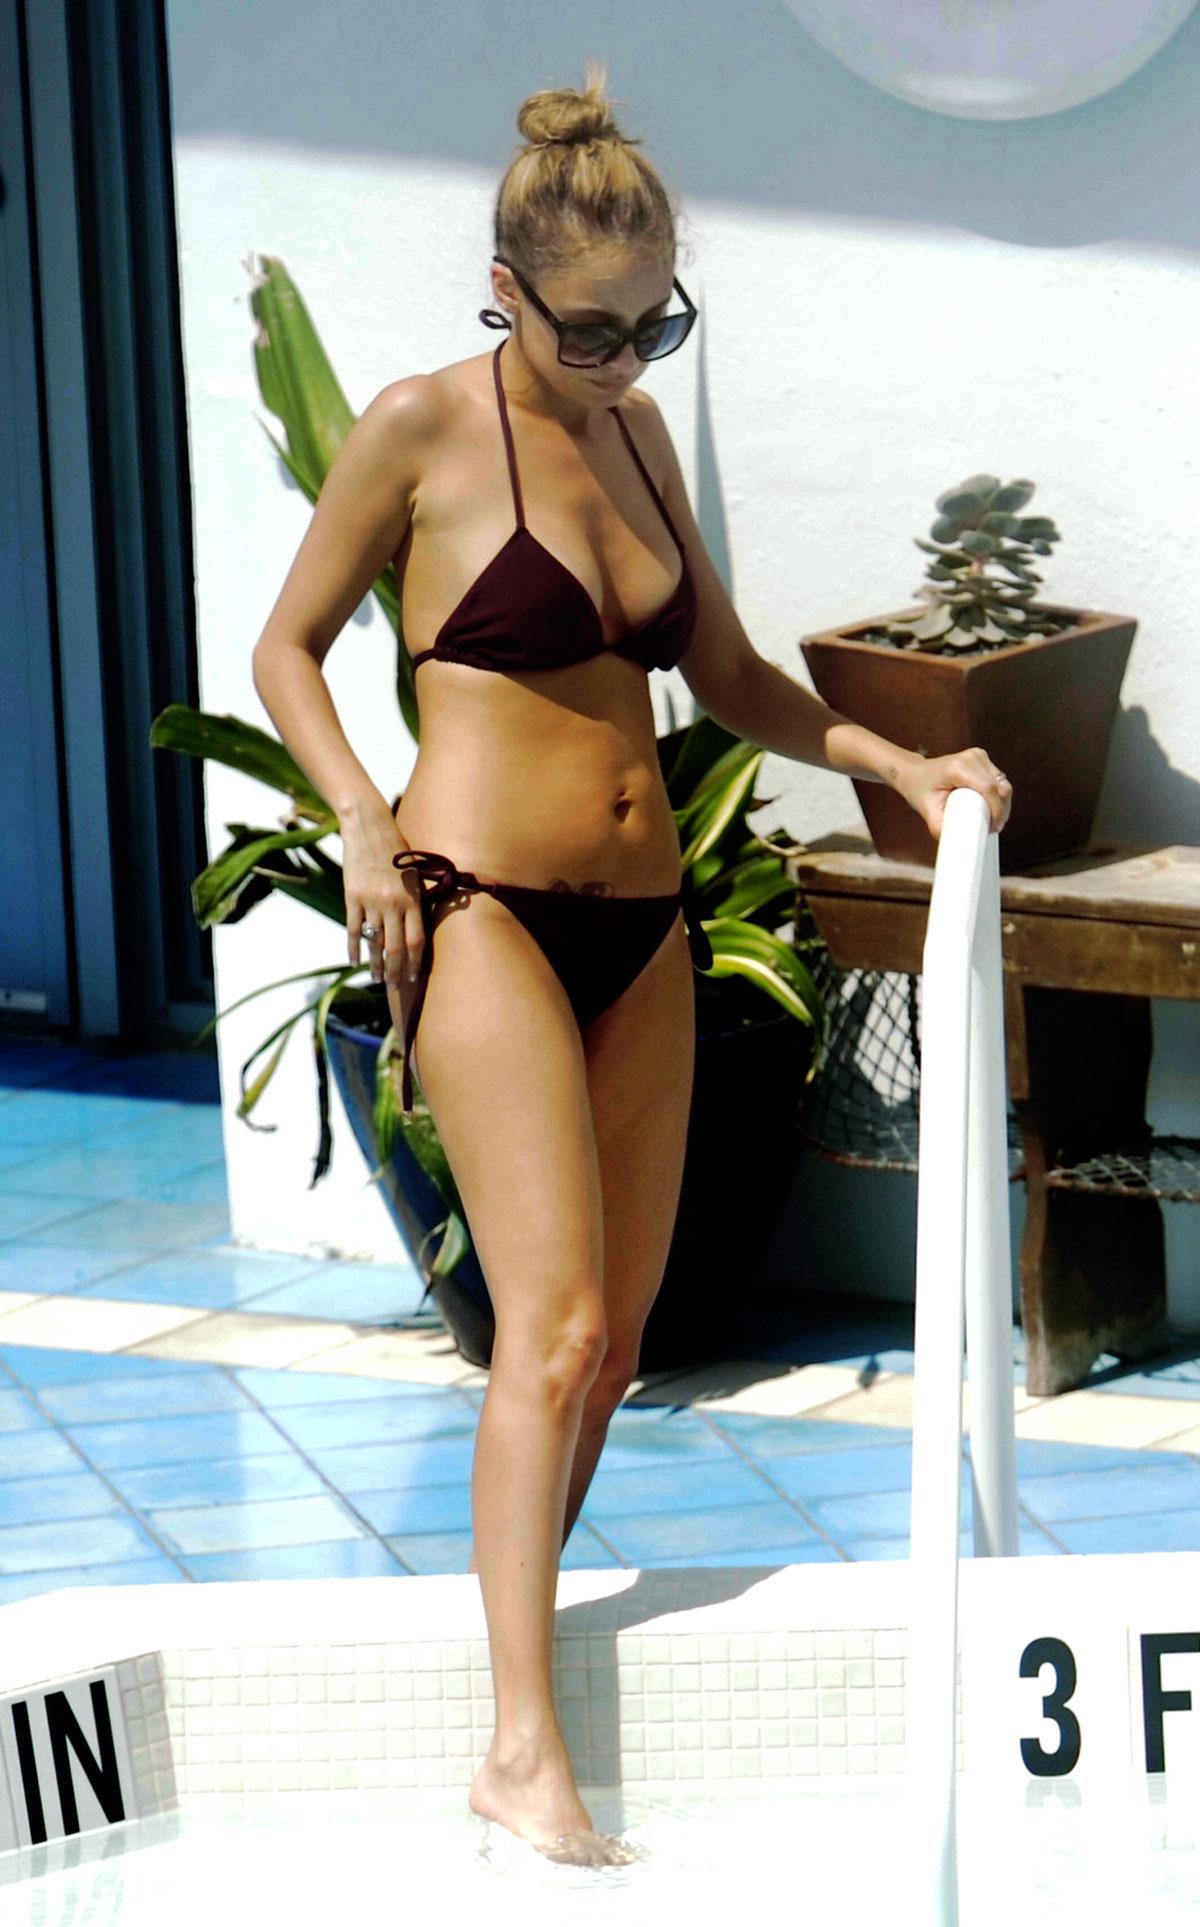 Popular Celebrity: Nicole Richie Hot in Bikini at Poolside in Miami-Photos